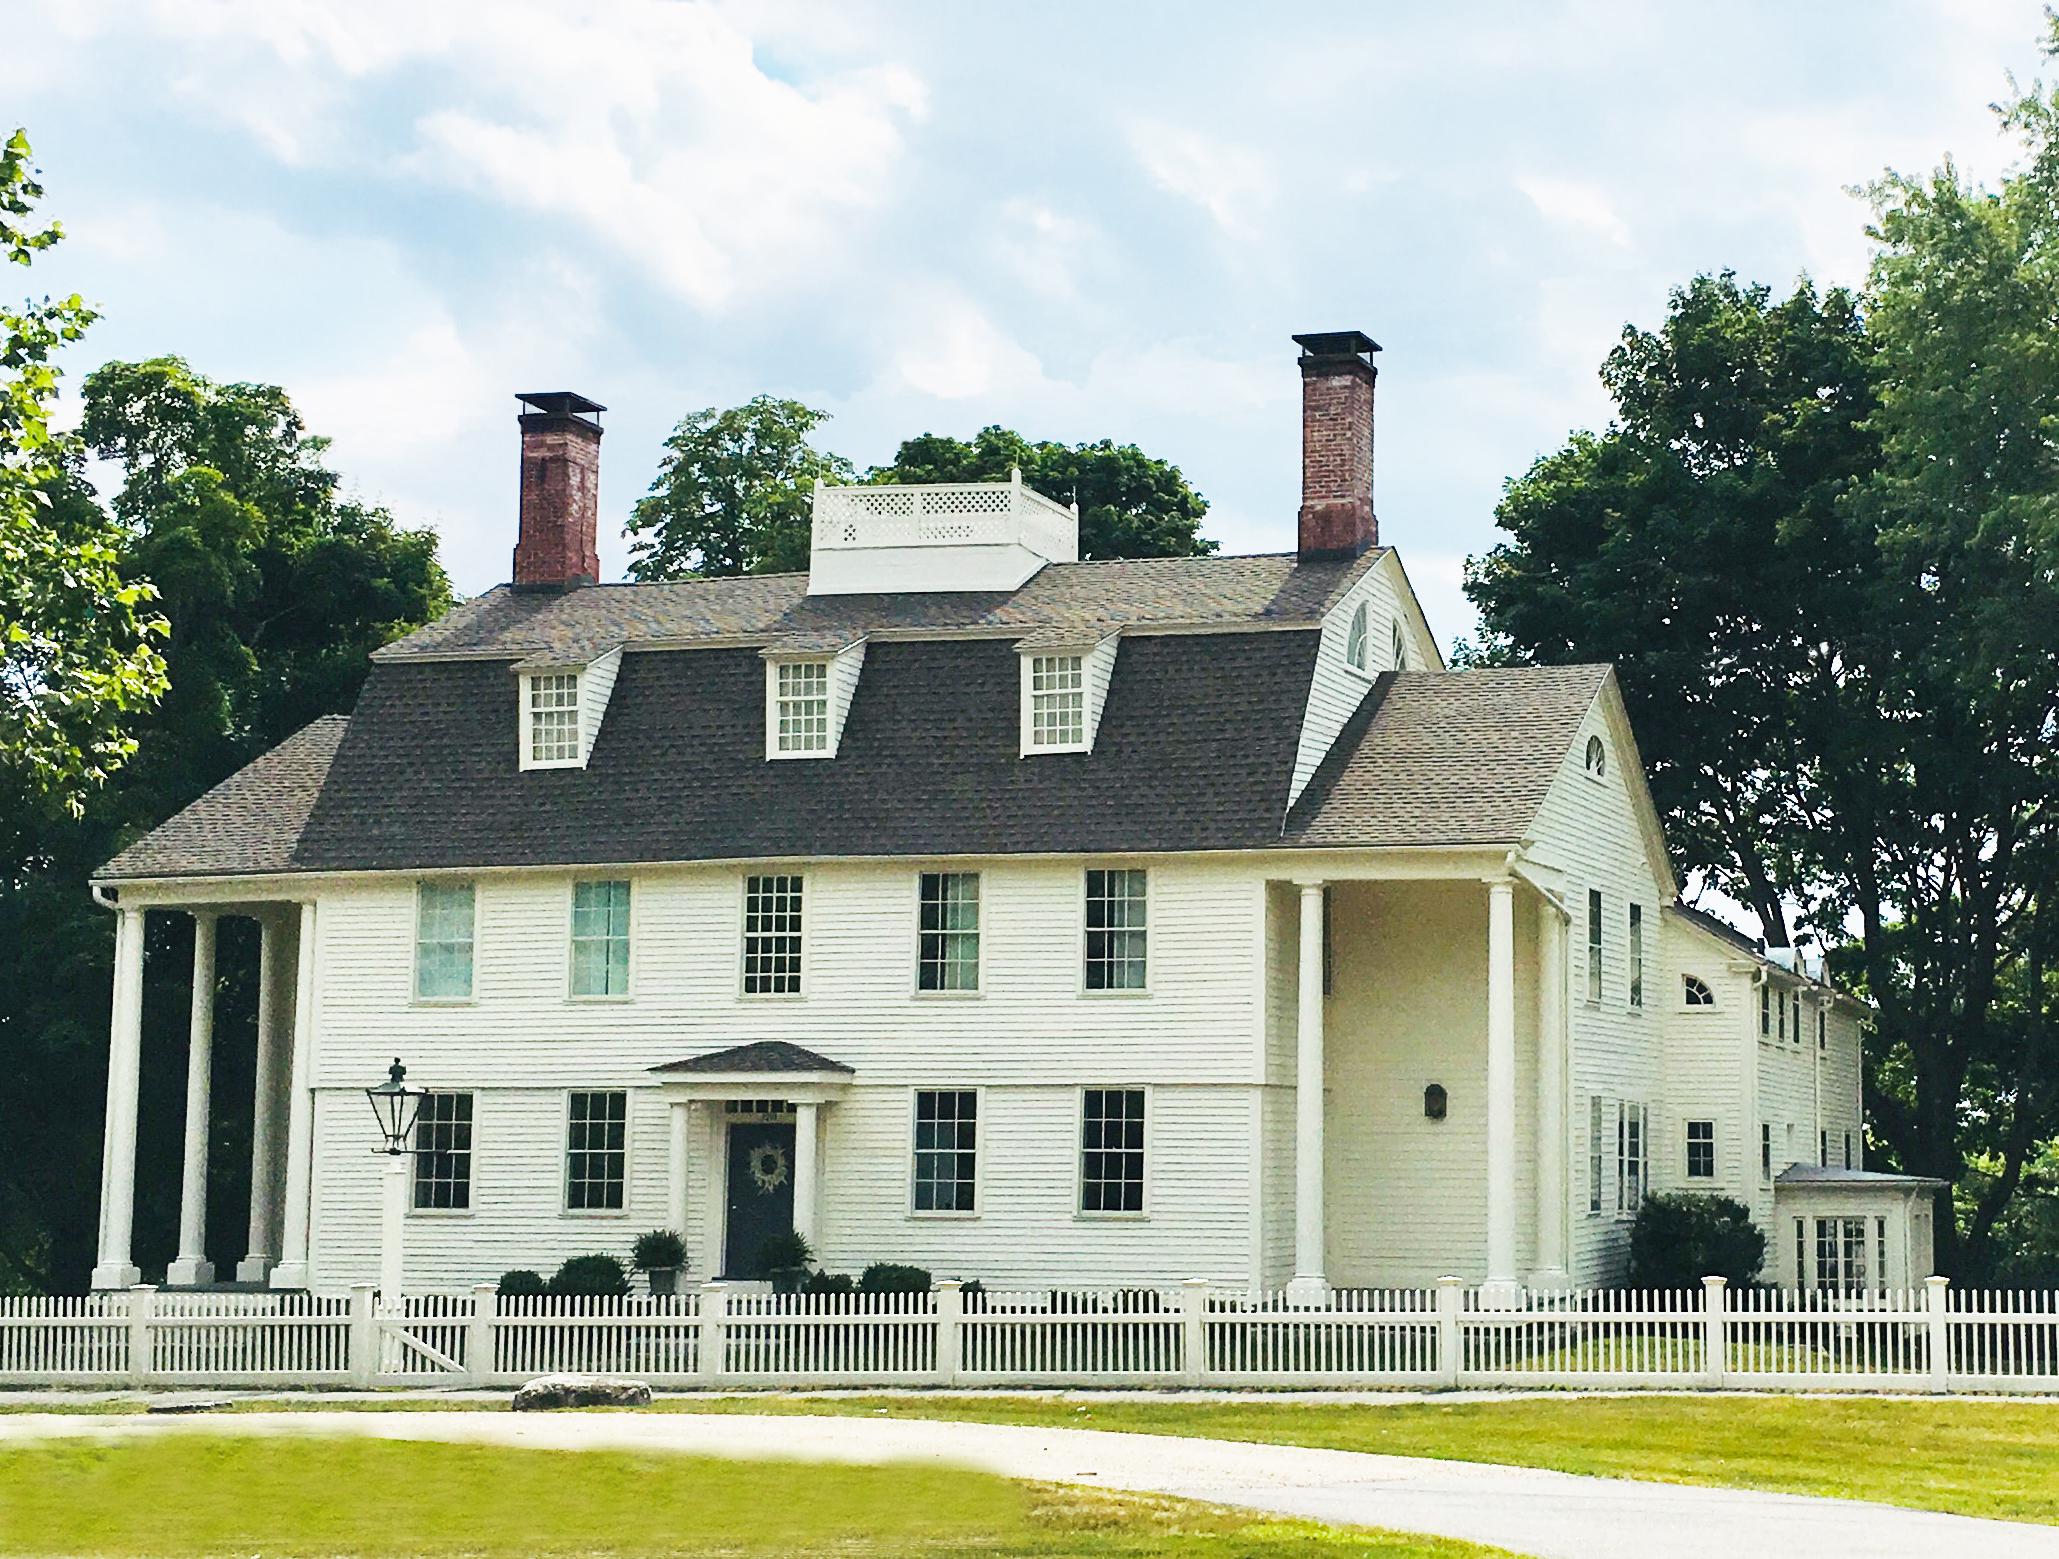 1775.Colonel Benjamin Tallmadge House. Marla Patterson.jpg